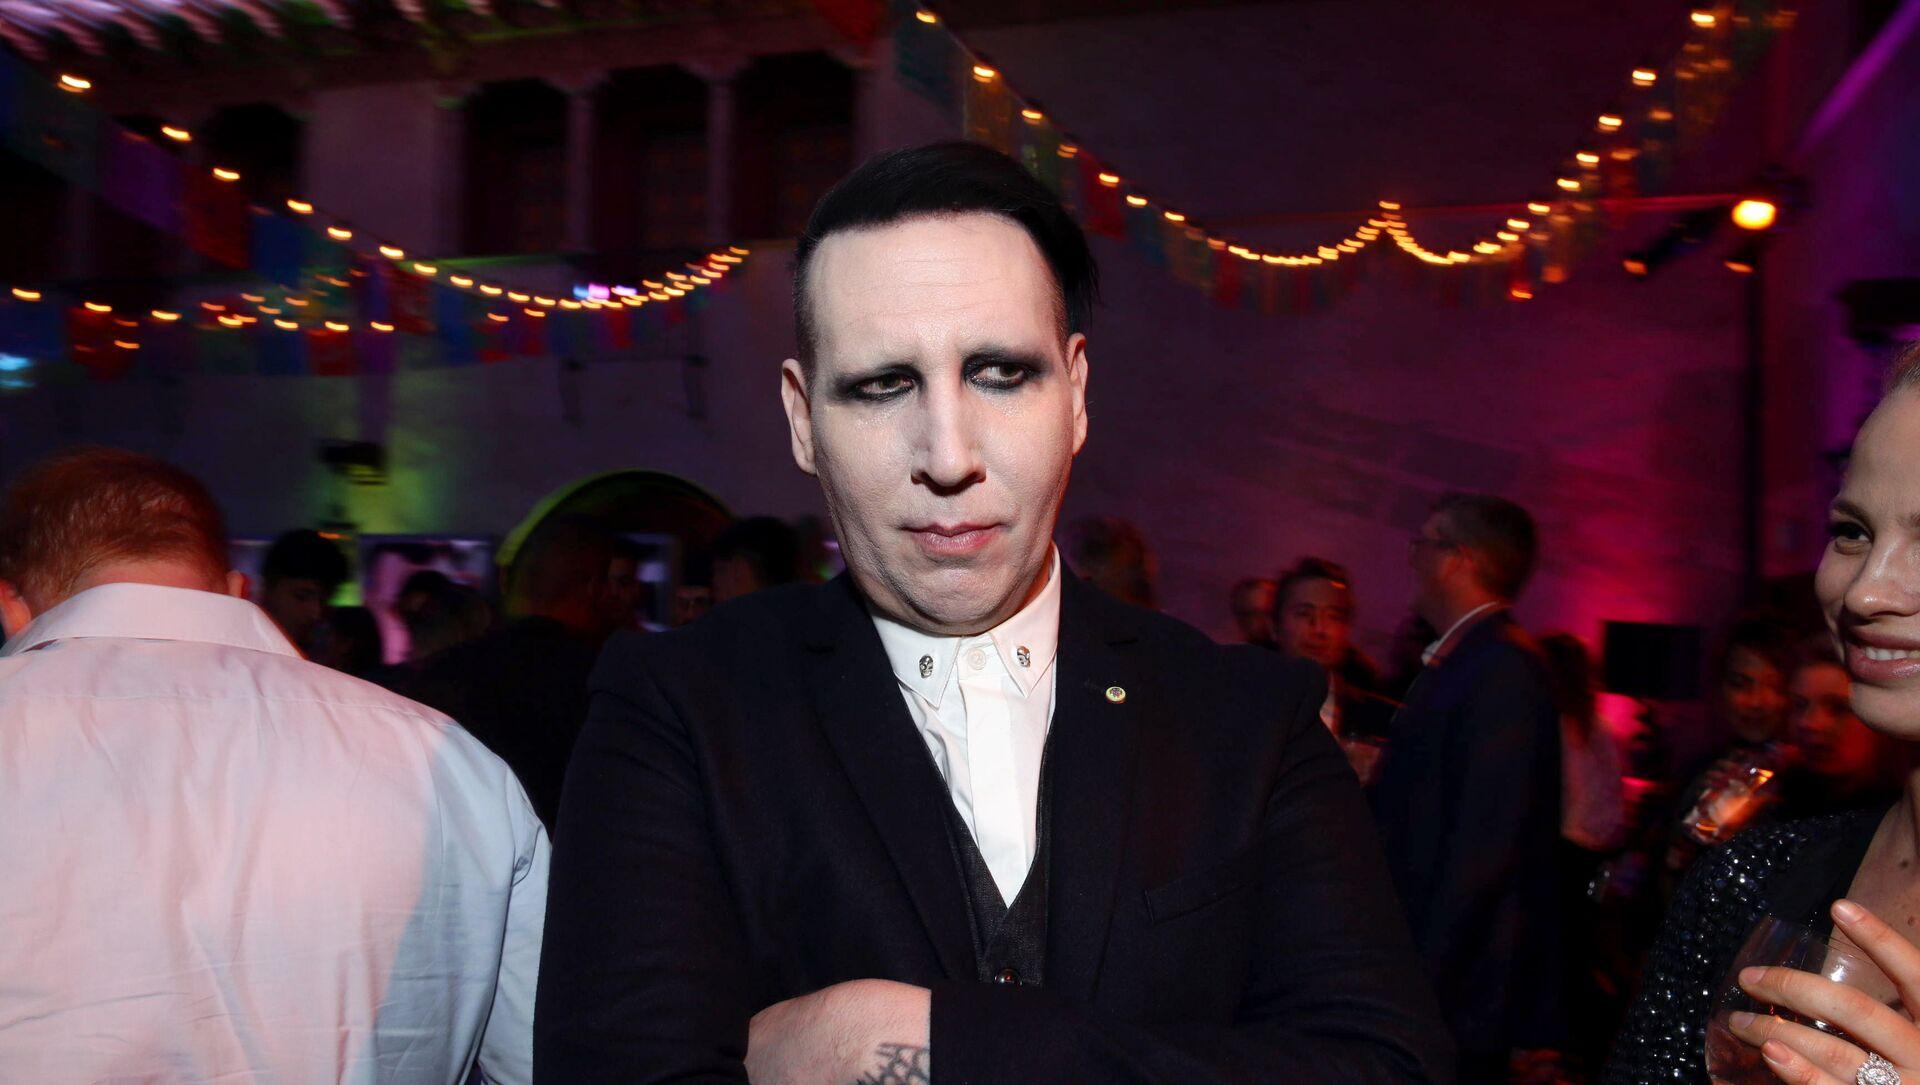 Marilyn Manson, cantante estadounidense - Sputnik Mundo, 1920, 02.02.2021